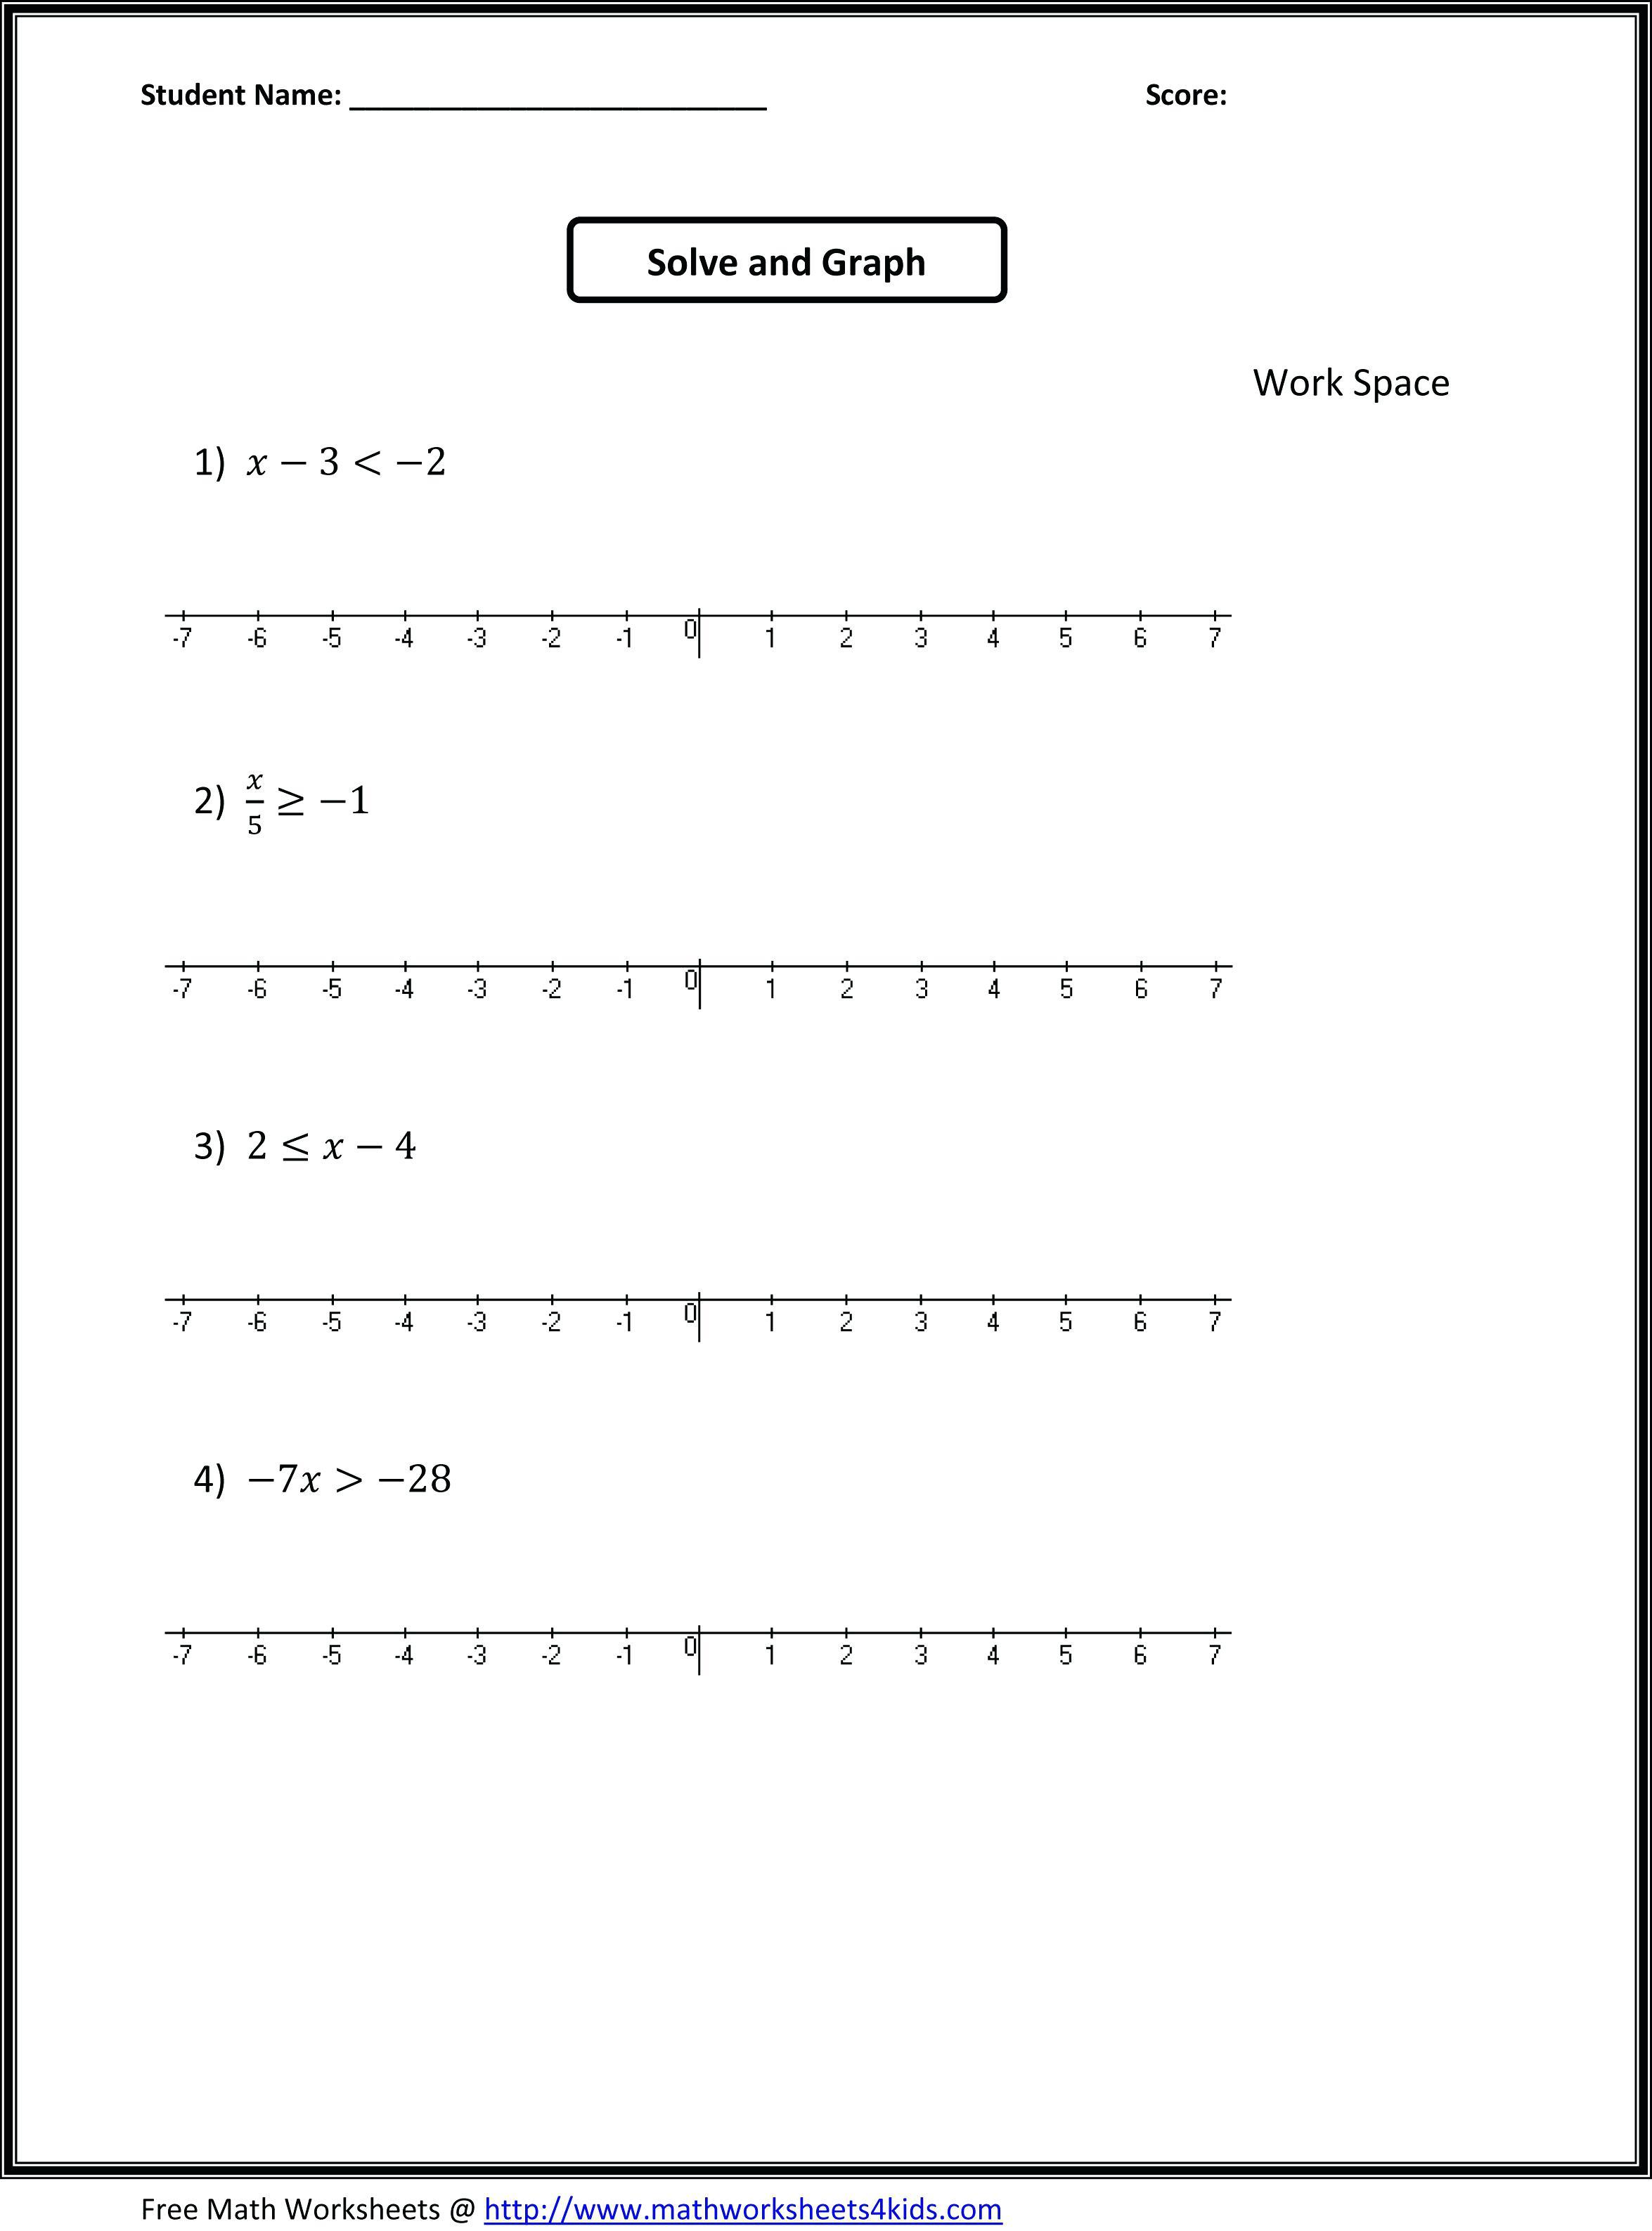 Algebra: 8Th Grade Math Worksheets Algebra Printable Worksheet For | 7Th Grade Math Worksheets Free Printable With Answers